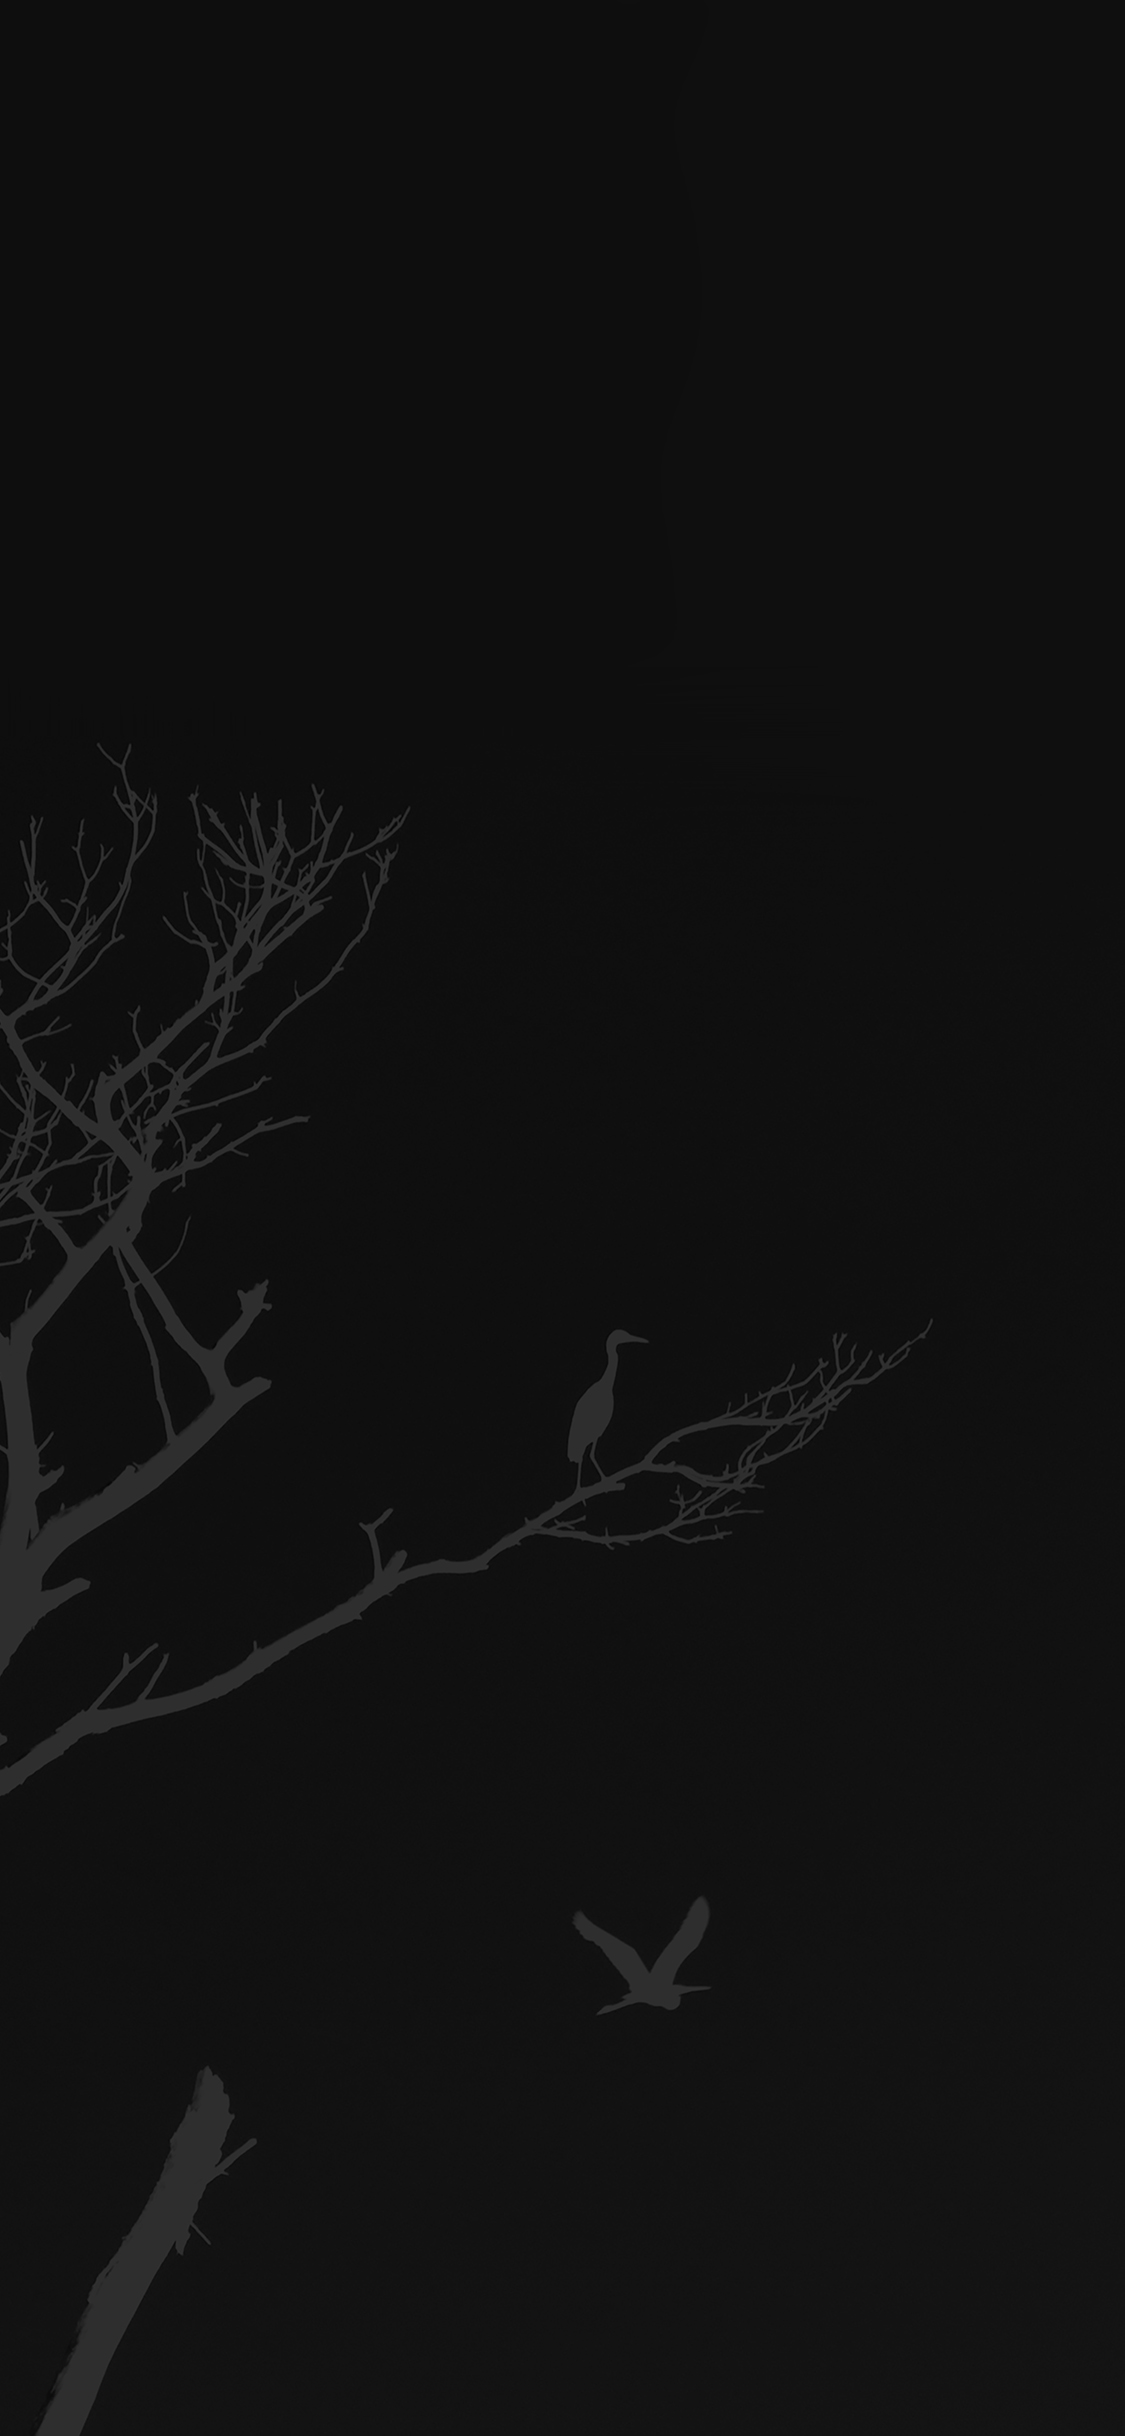 iPhoneXpapers.com-Apple-iPhone-wallpaper-mk98-bird-sunset-tree-dark-nature-minimal